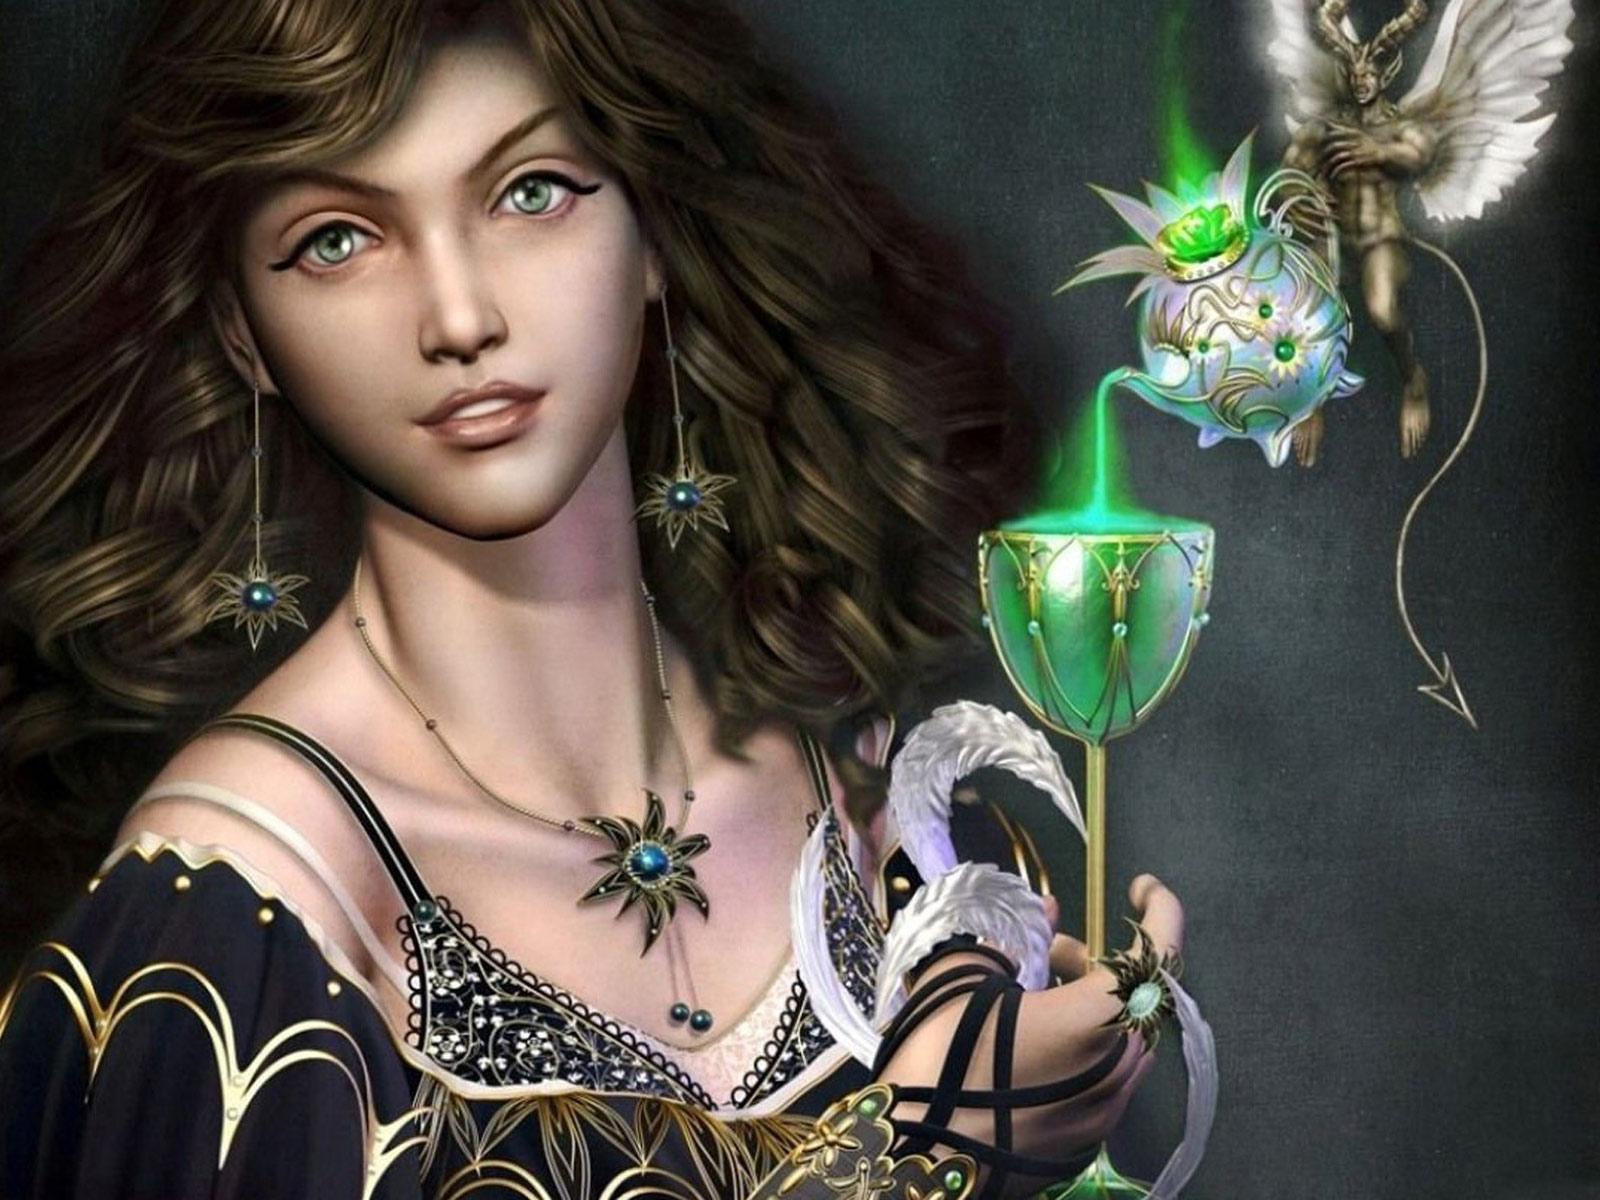 venta de loteria de la bruja de oro: